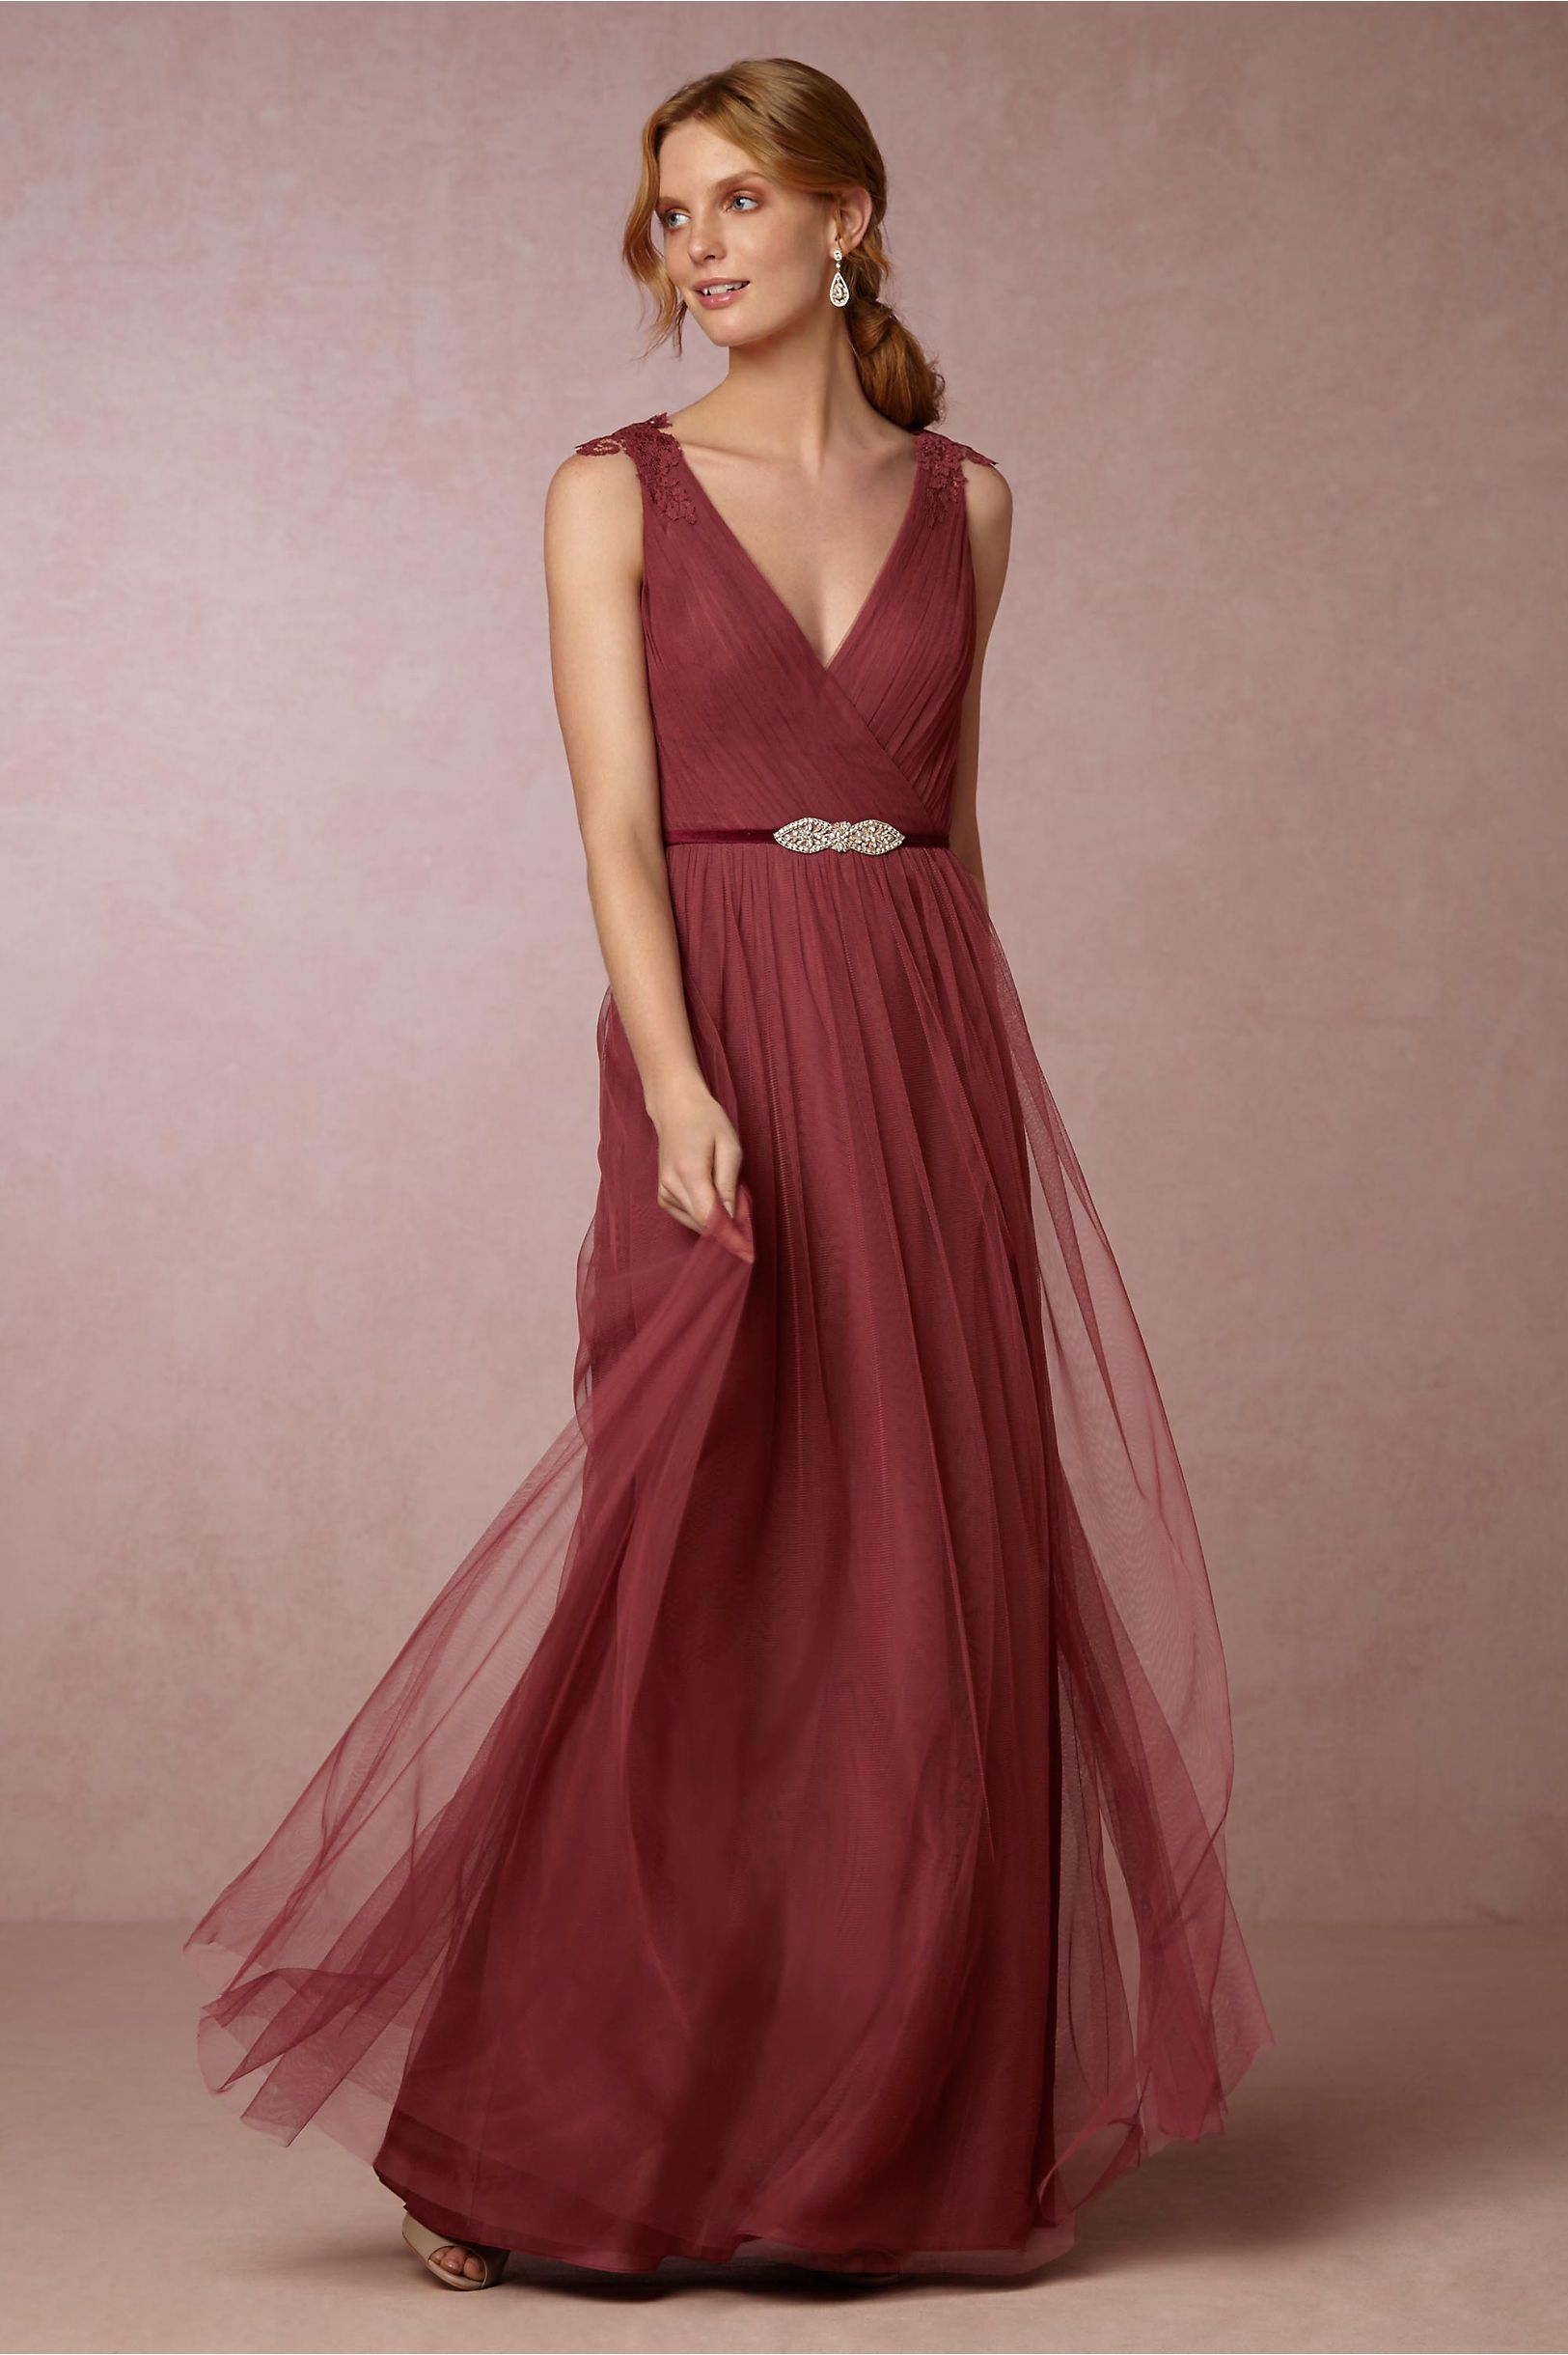 Bhldn pippa dress in sale dresses bhldn bridesmaid dresses